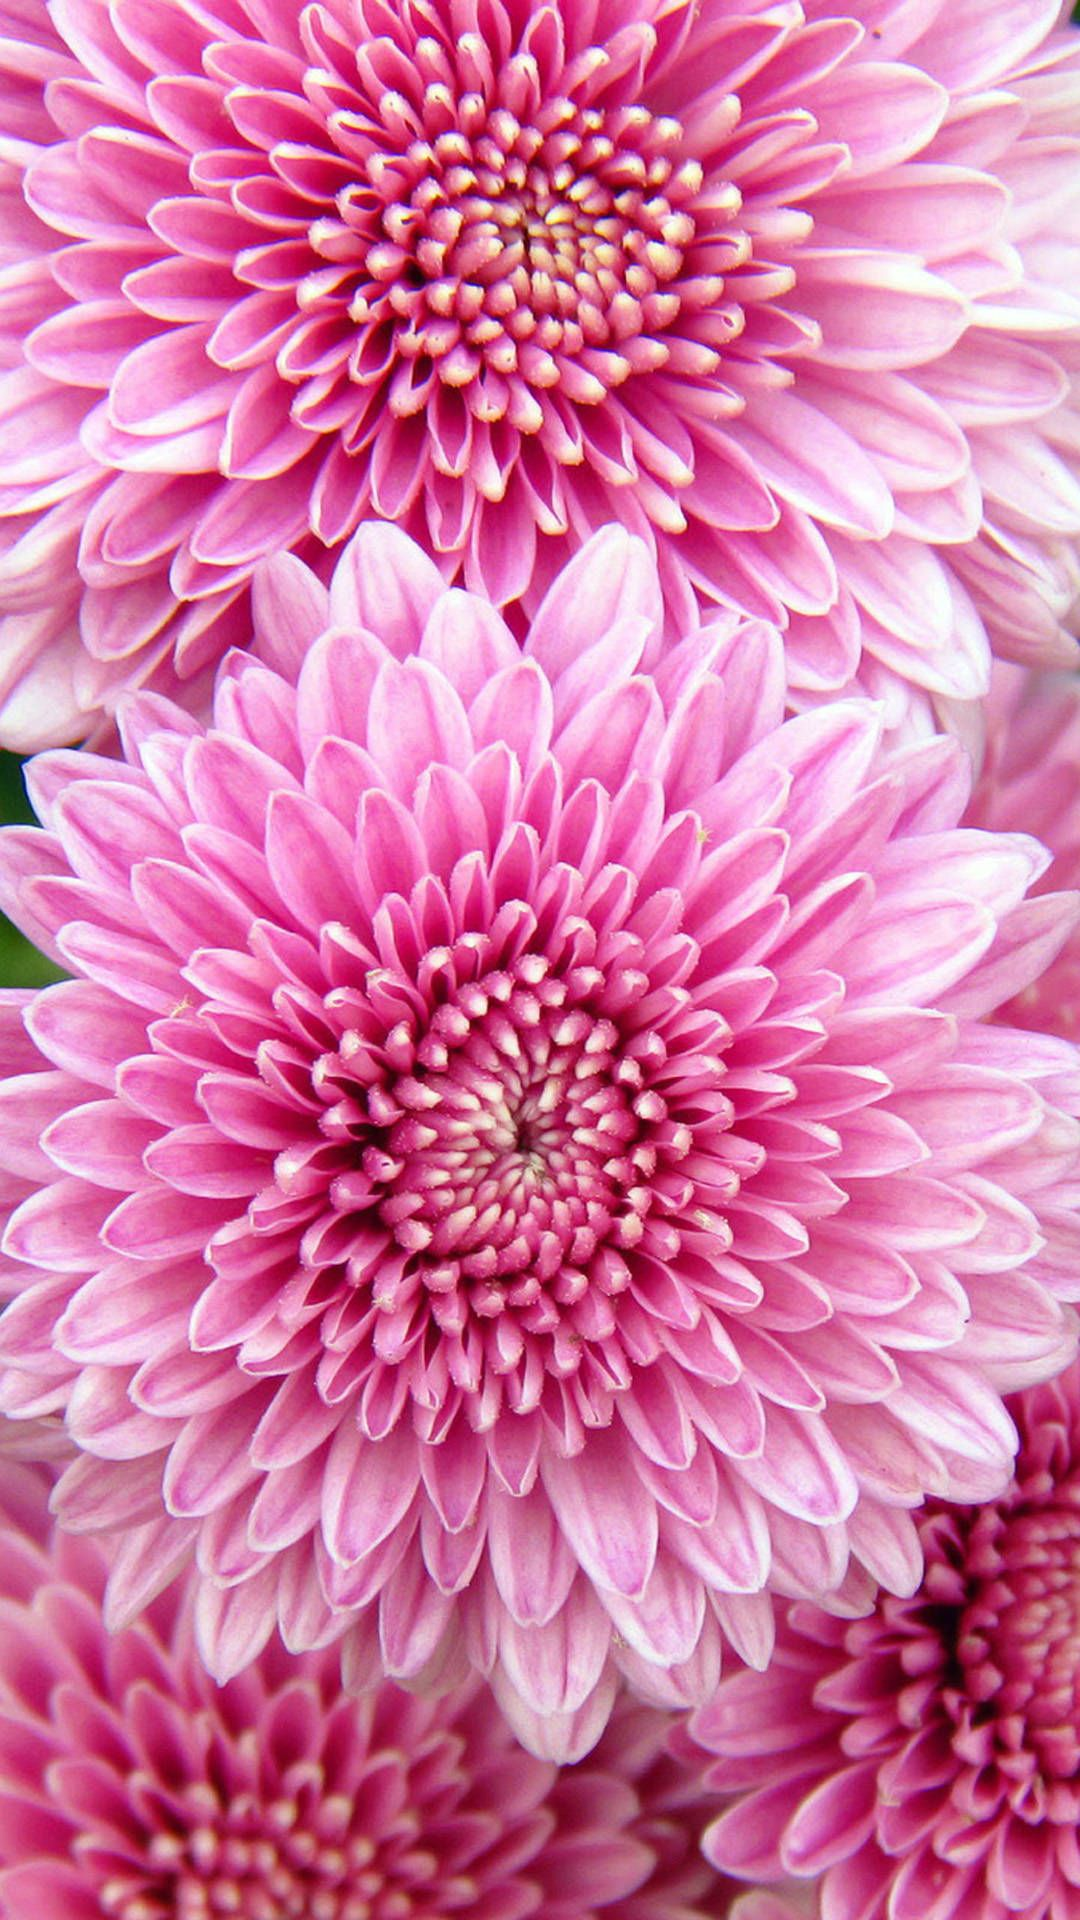 Bright Chrysanthemum Flowers 2913 Samsung Hd Wallpapers Flower Iphone Wallpaper Best Flower Wallpaper New Flower Wallpaper